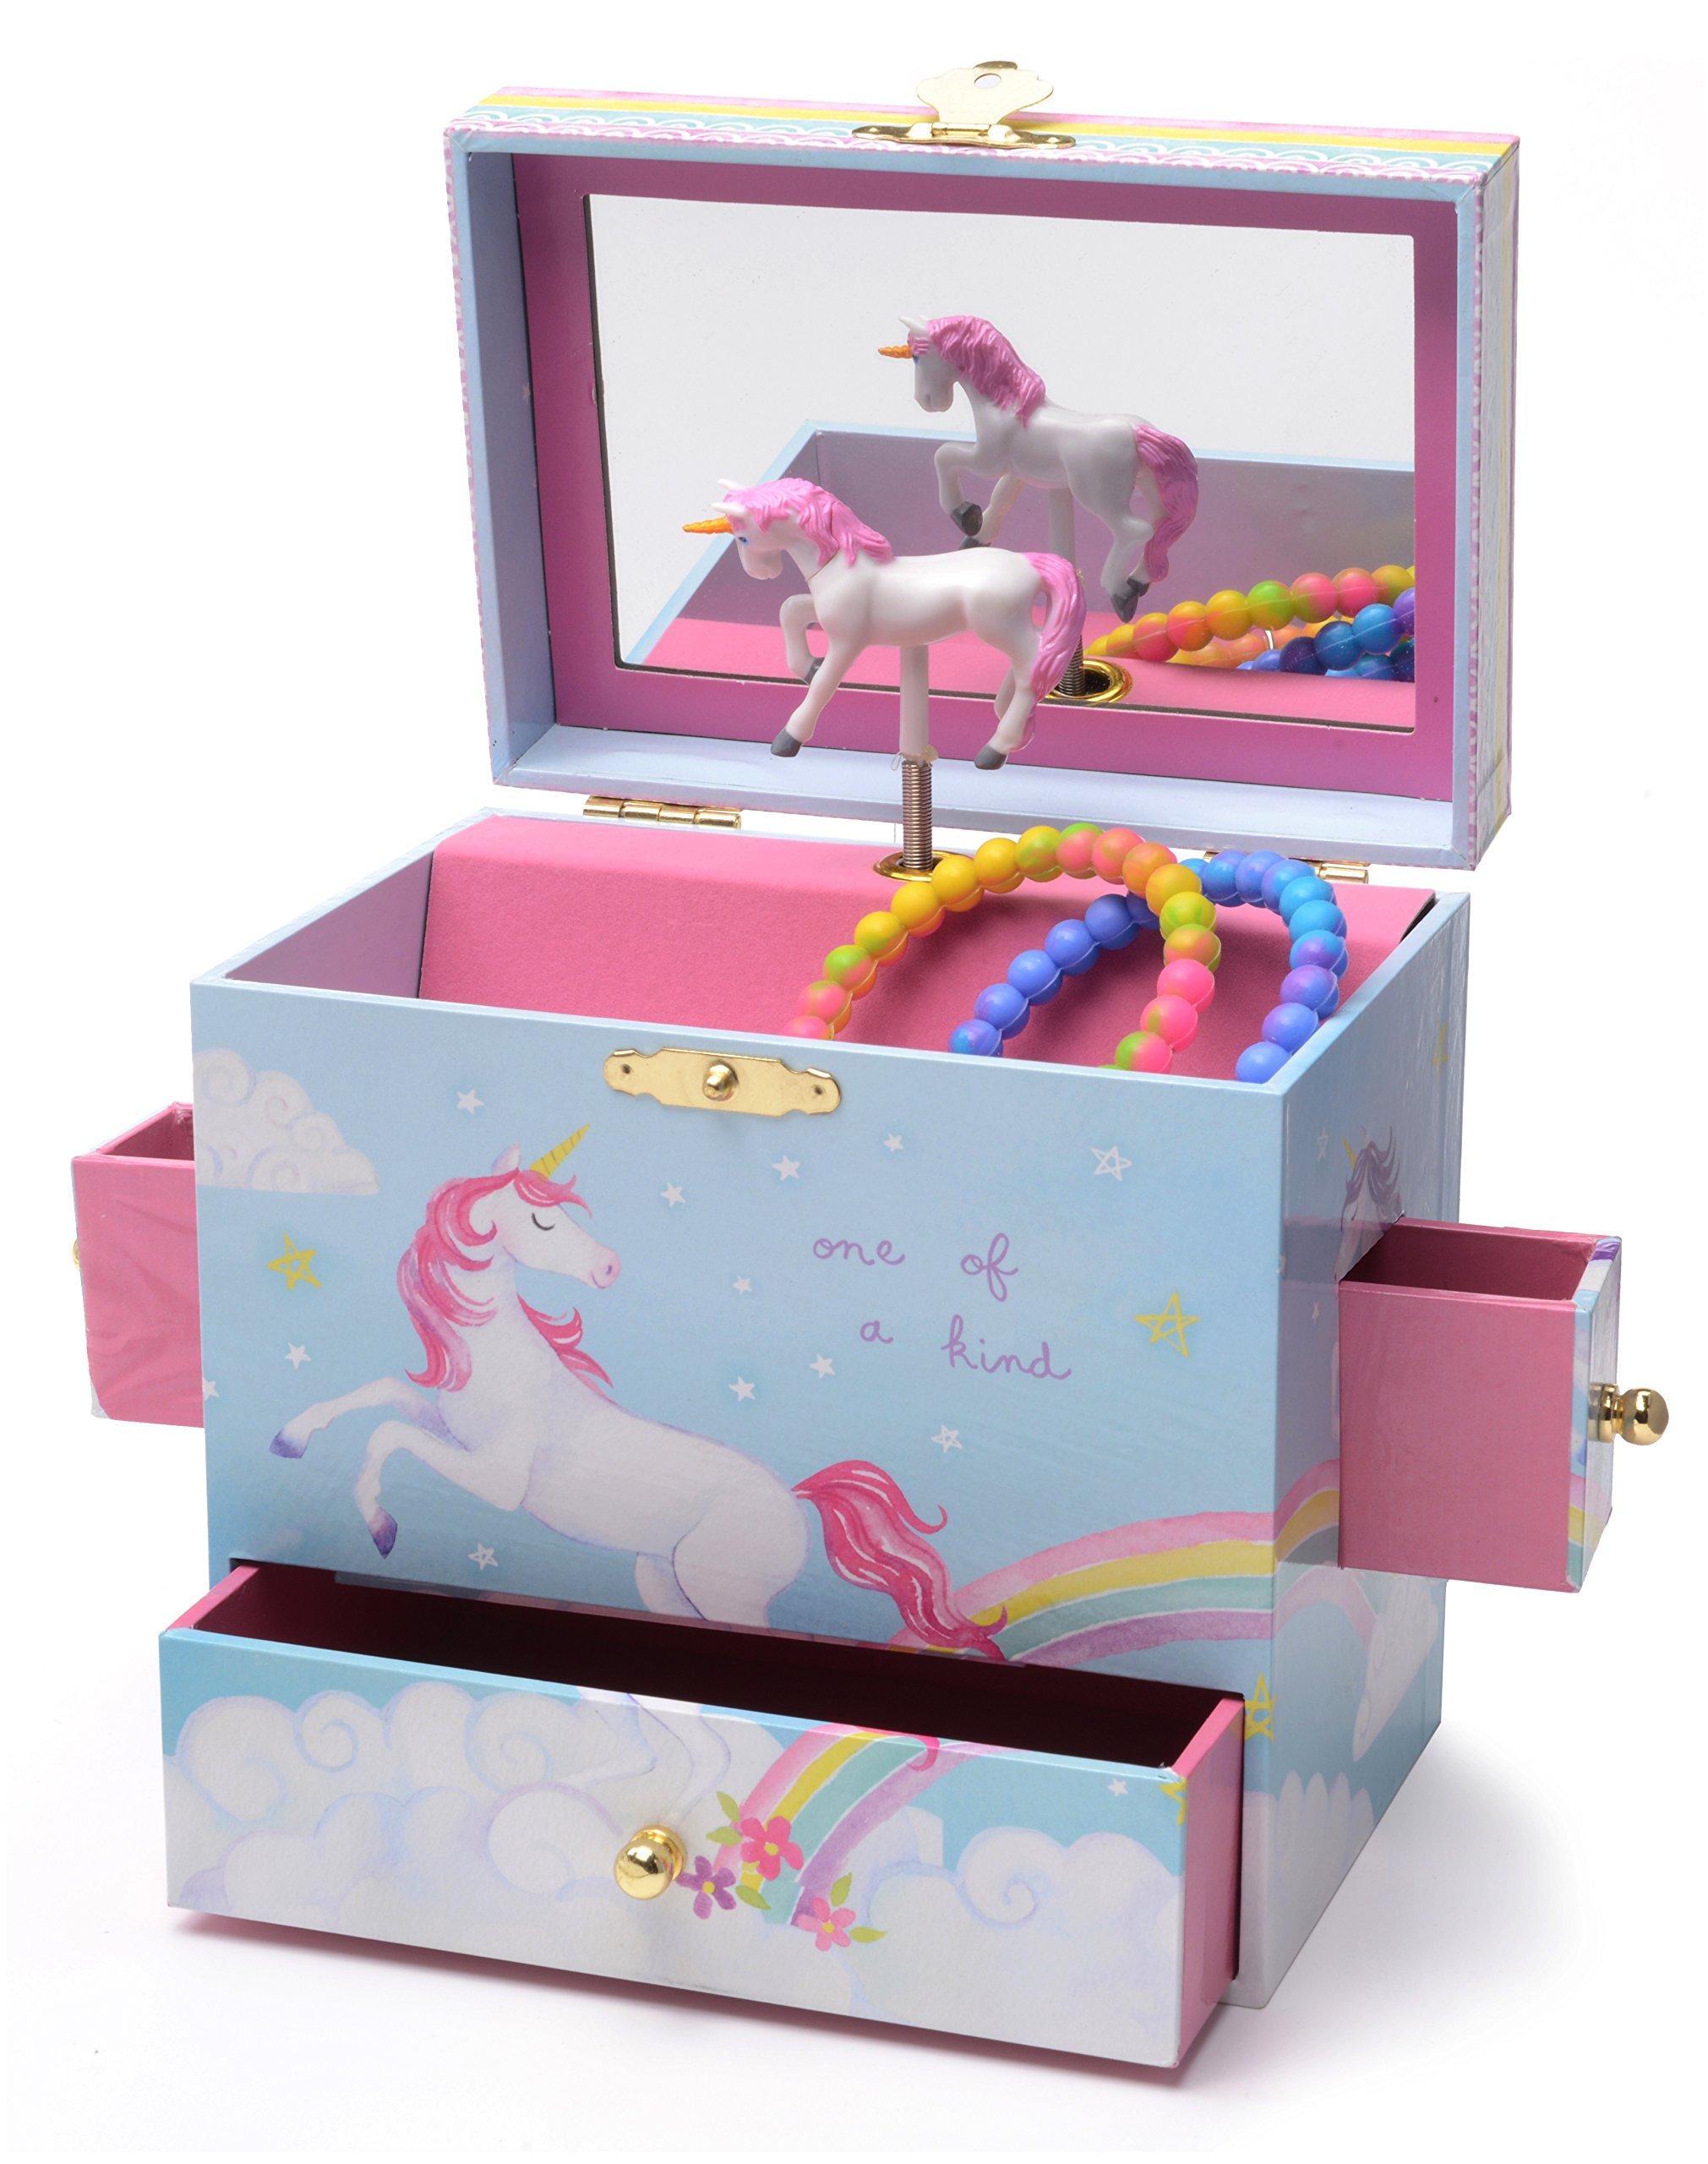 JewelKeeper Musical Jewelry Box with 3 Drawers, Rainbow Unicorn Design, Somewhere Over the Rainbow Tune